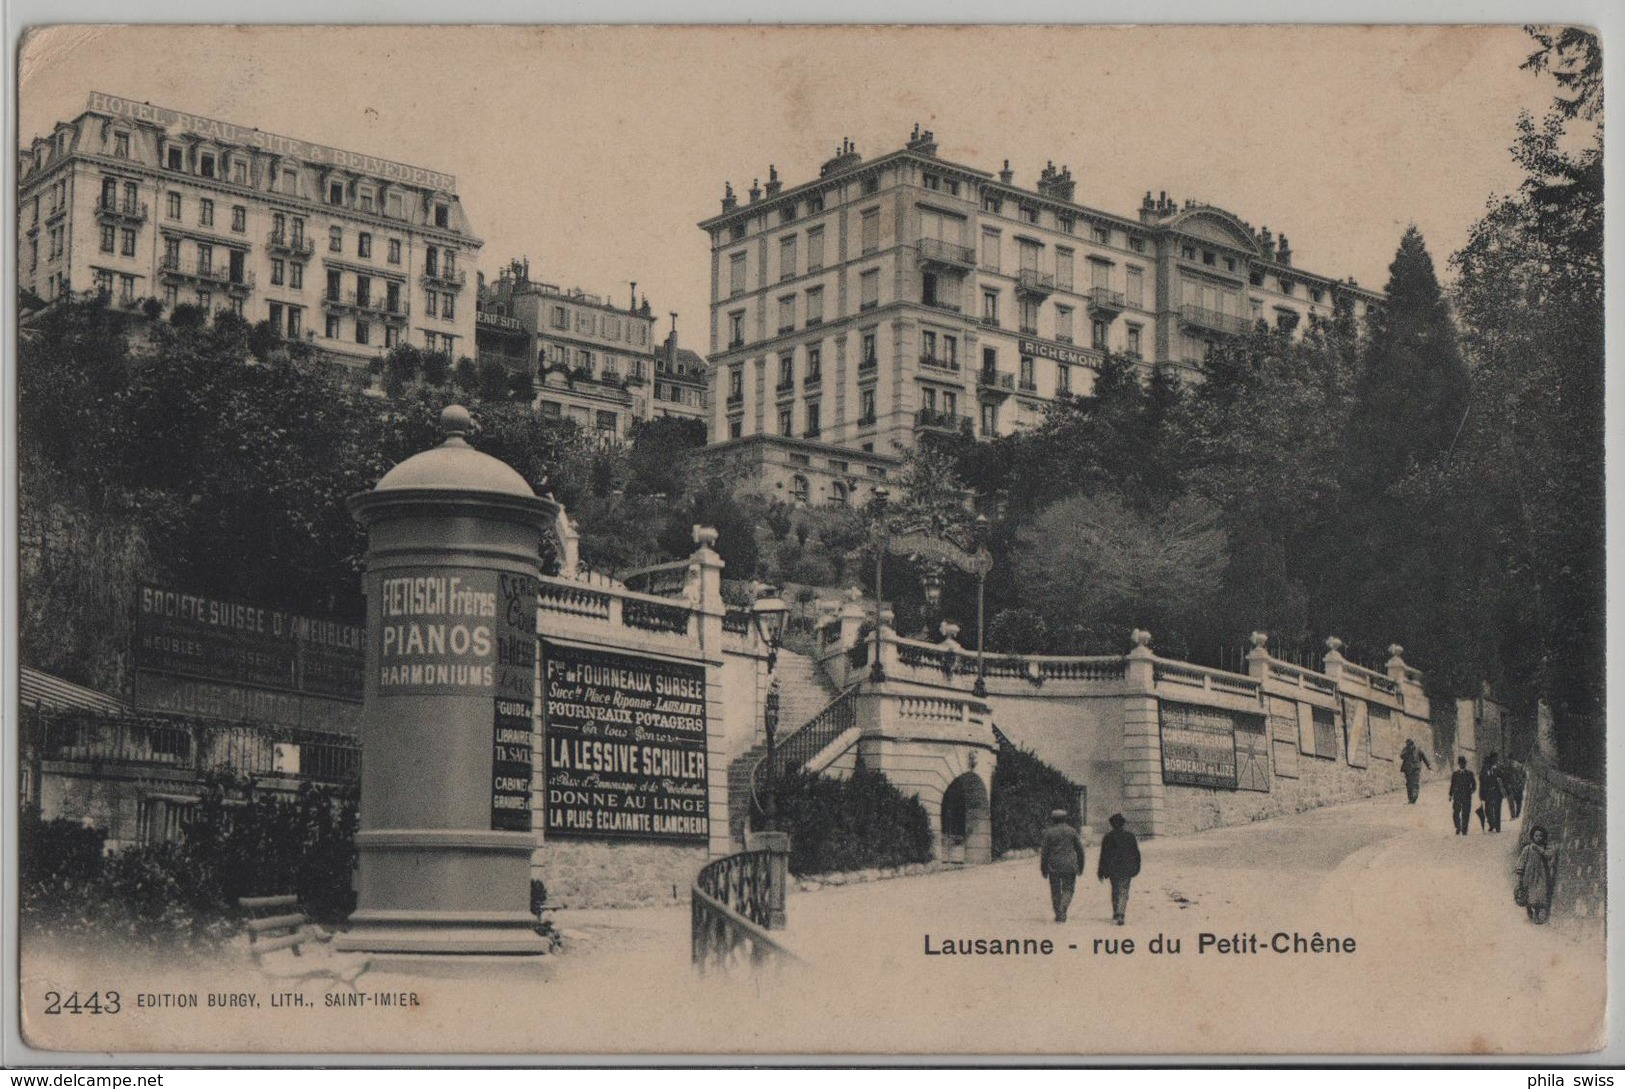 Lausanne - Rue Du Petit-Chene - Litfassäule - Animee - Photo: Burgy - VD Vaud